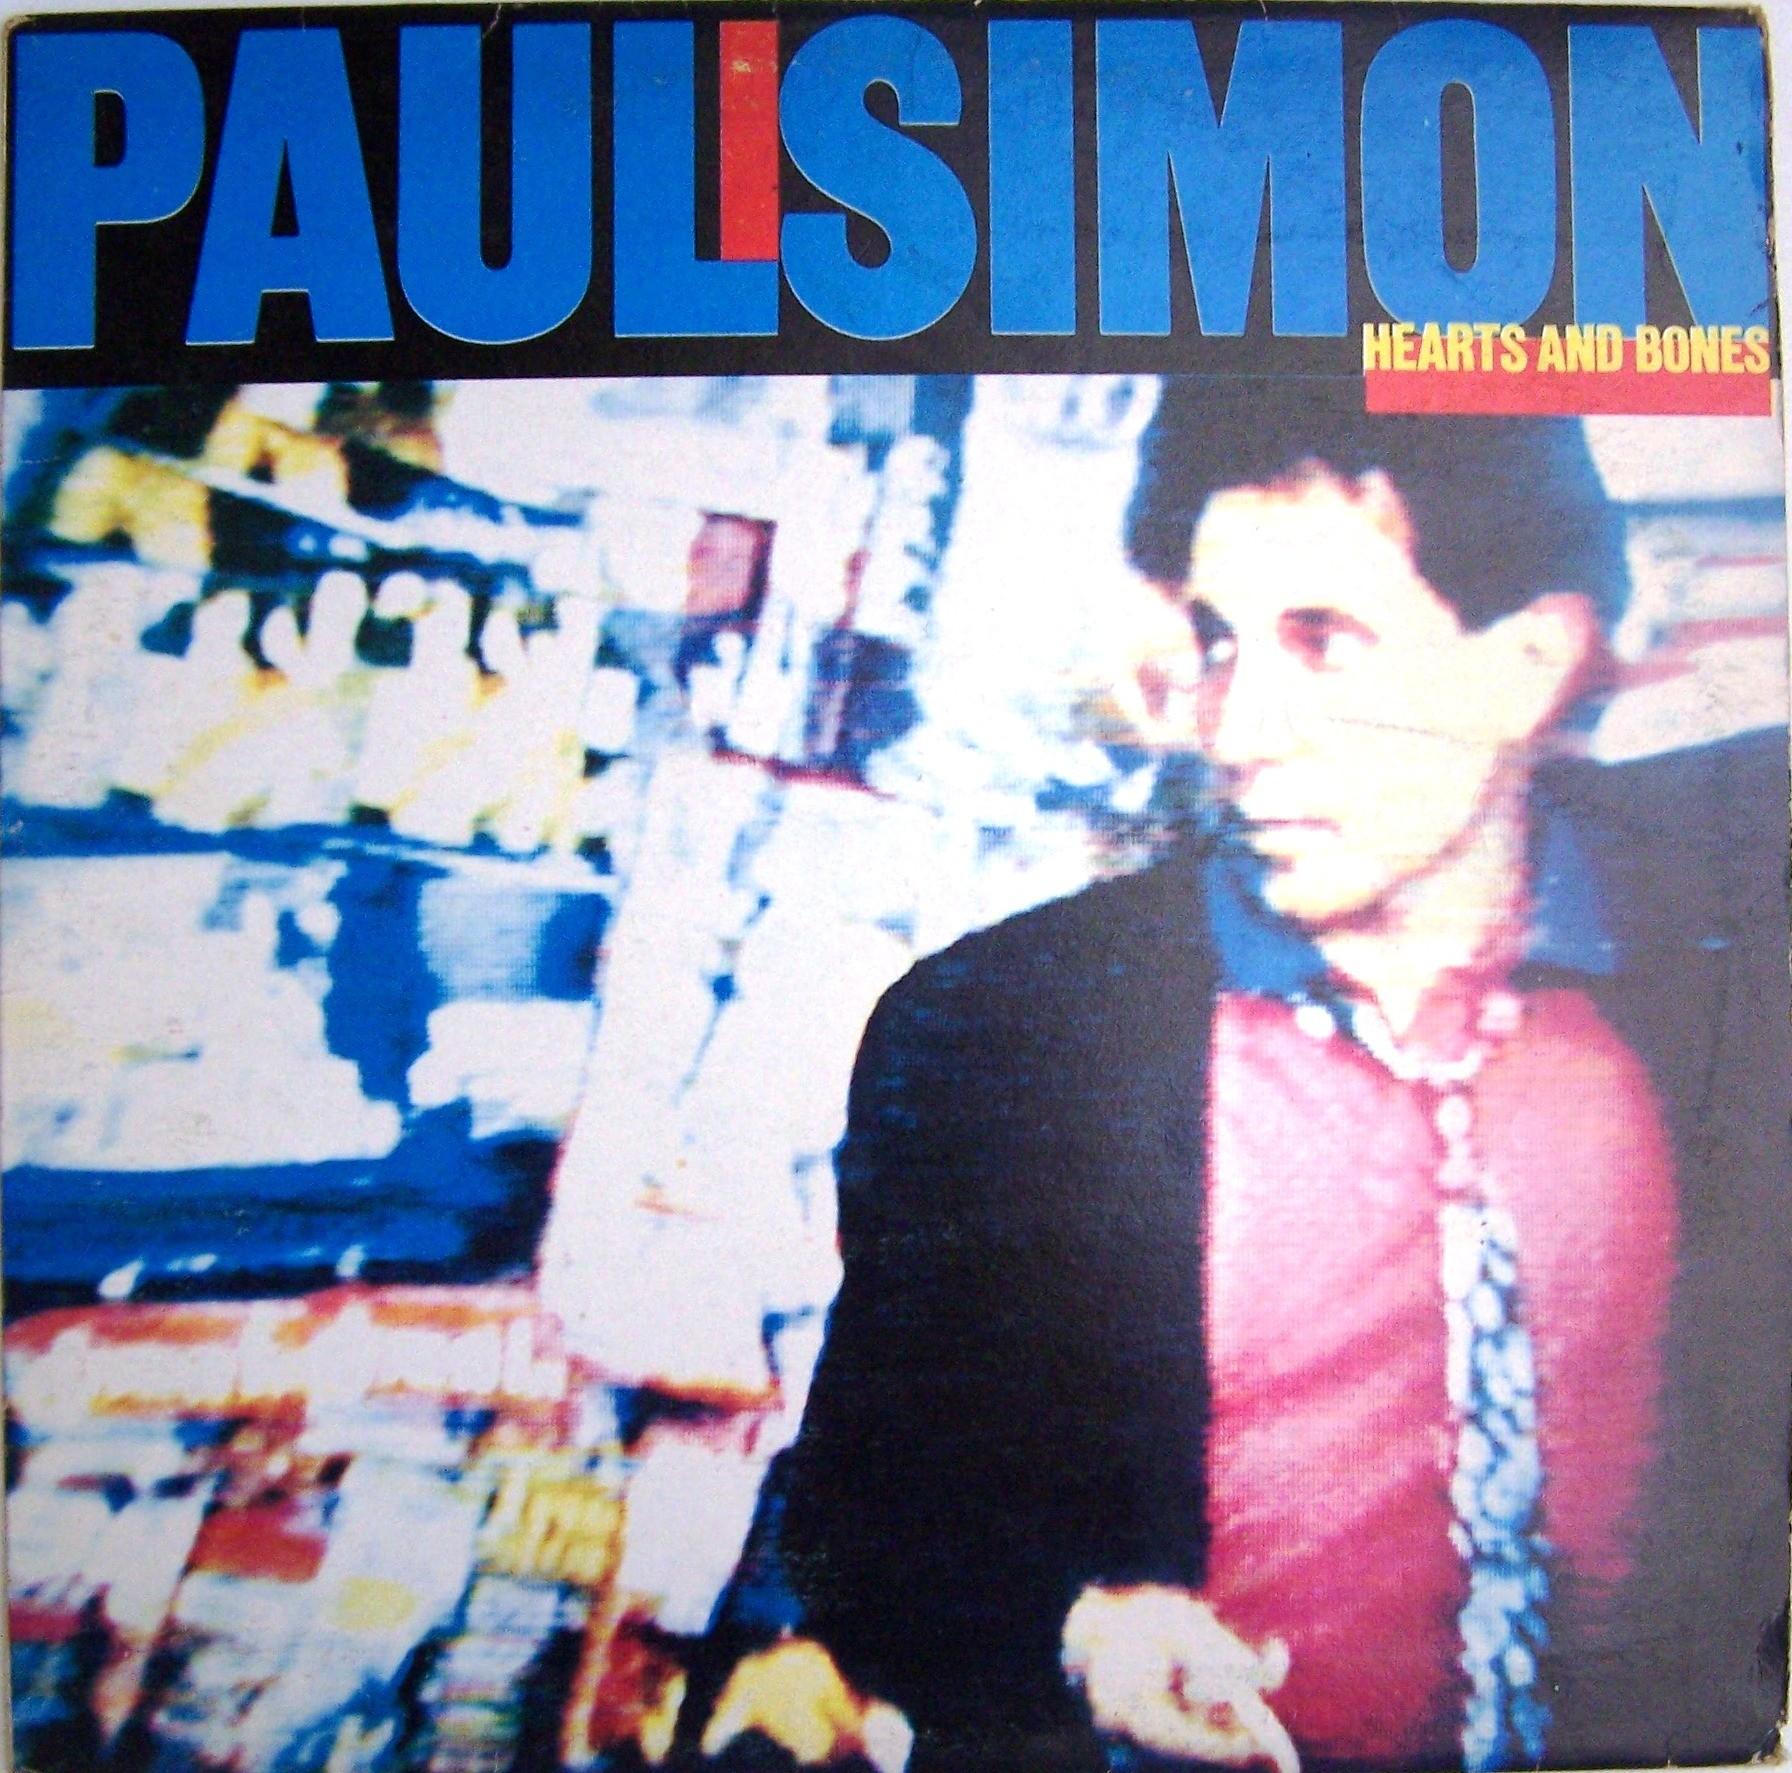 Simon Paul - Hearts And Bones